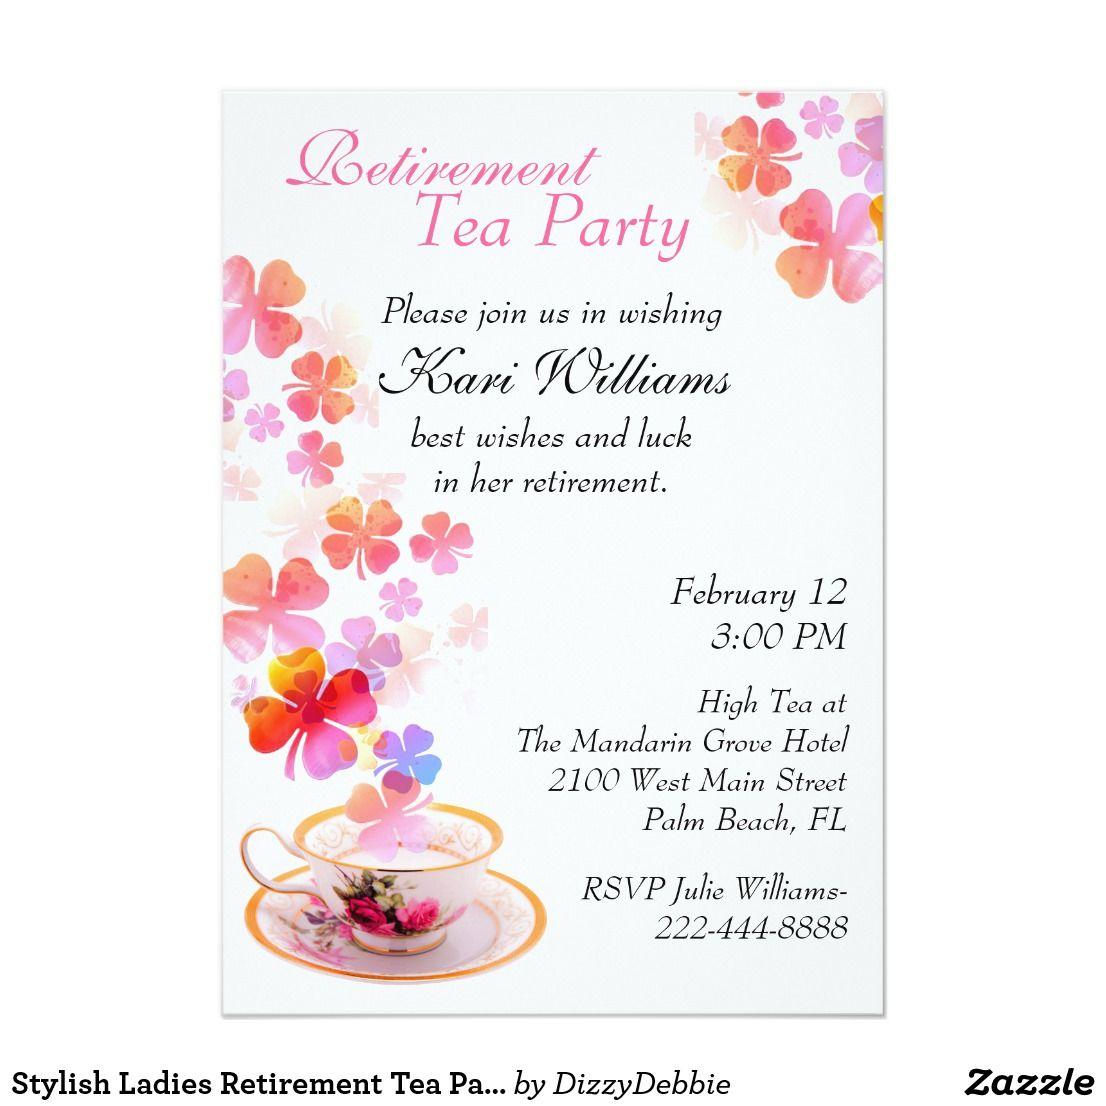 Stylish Ladies Retirement Tea Party Invitation | Tea party ...